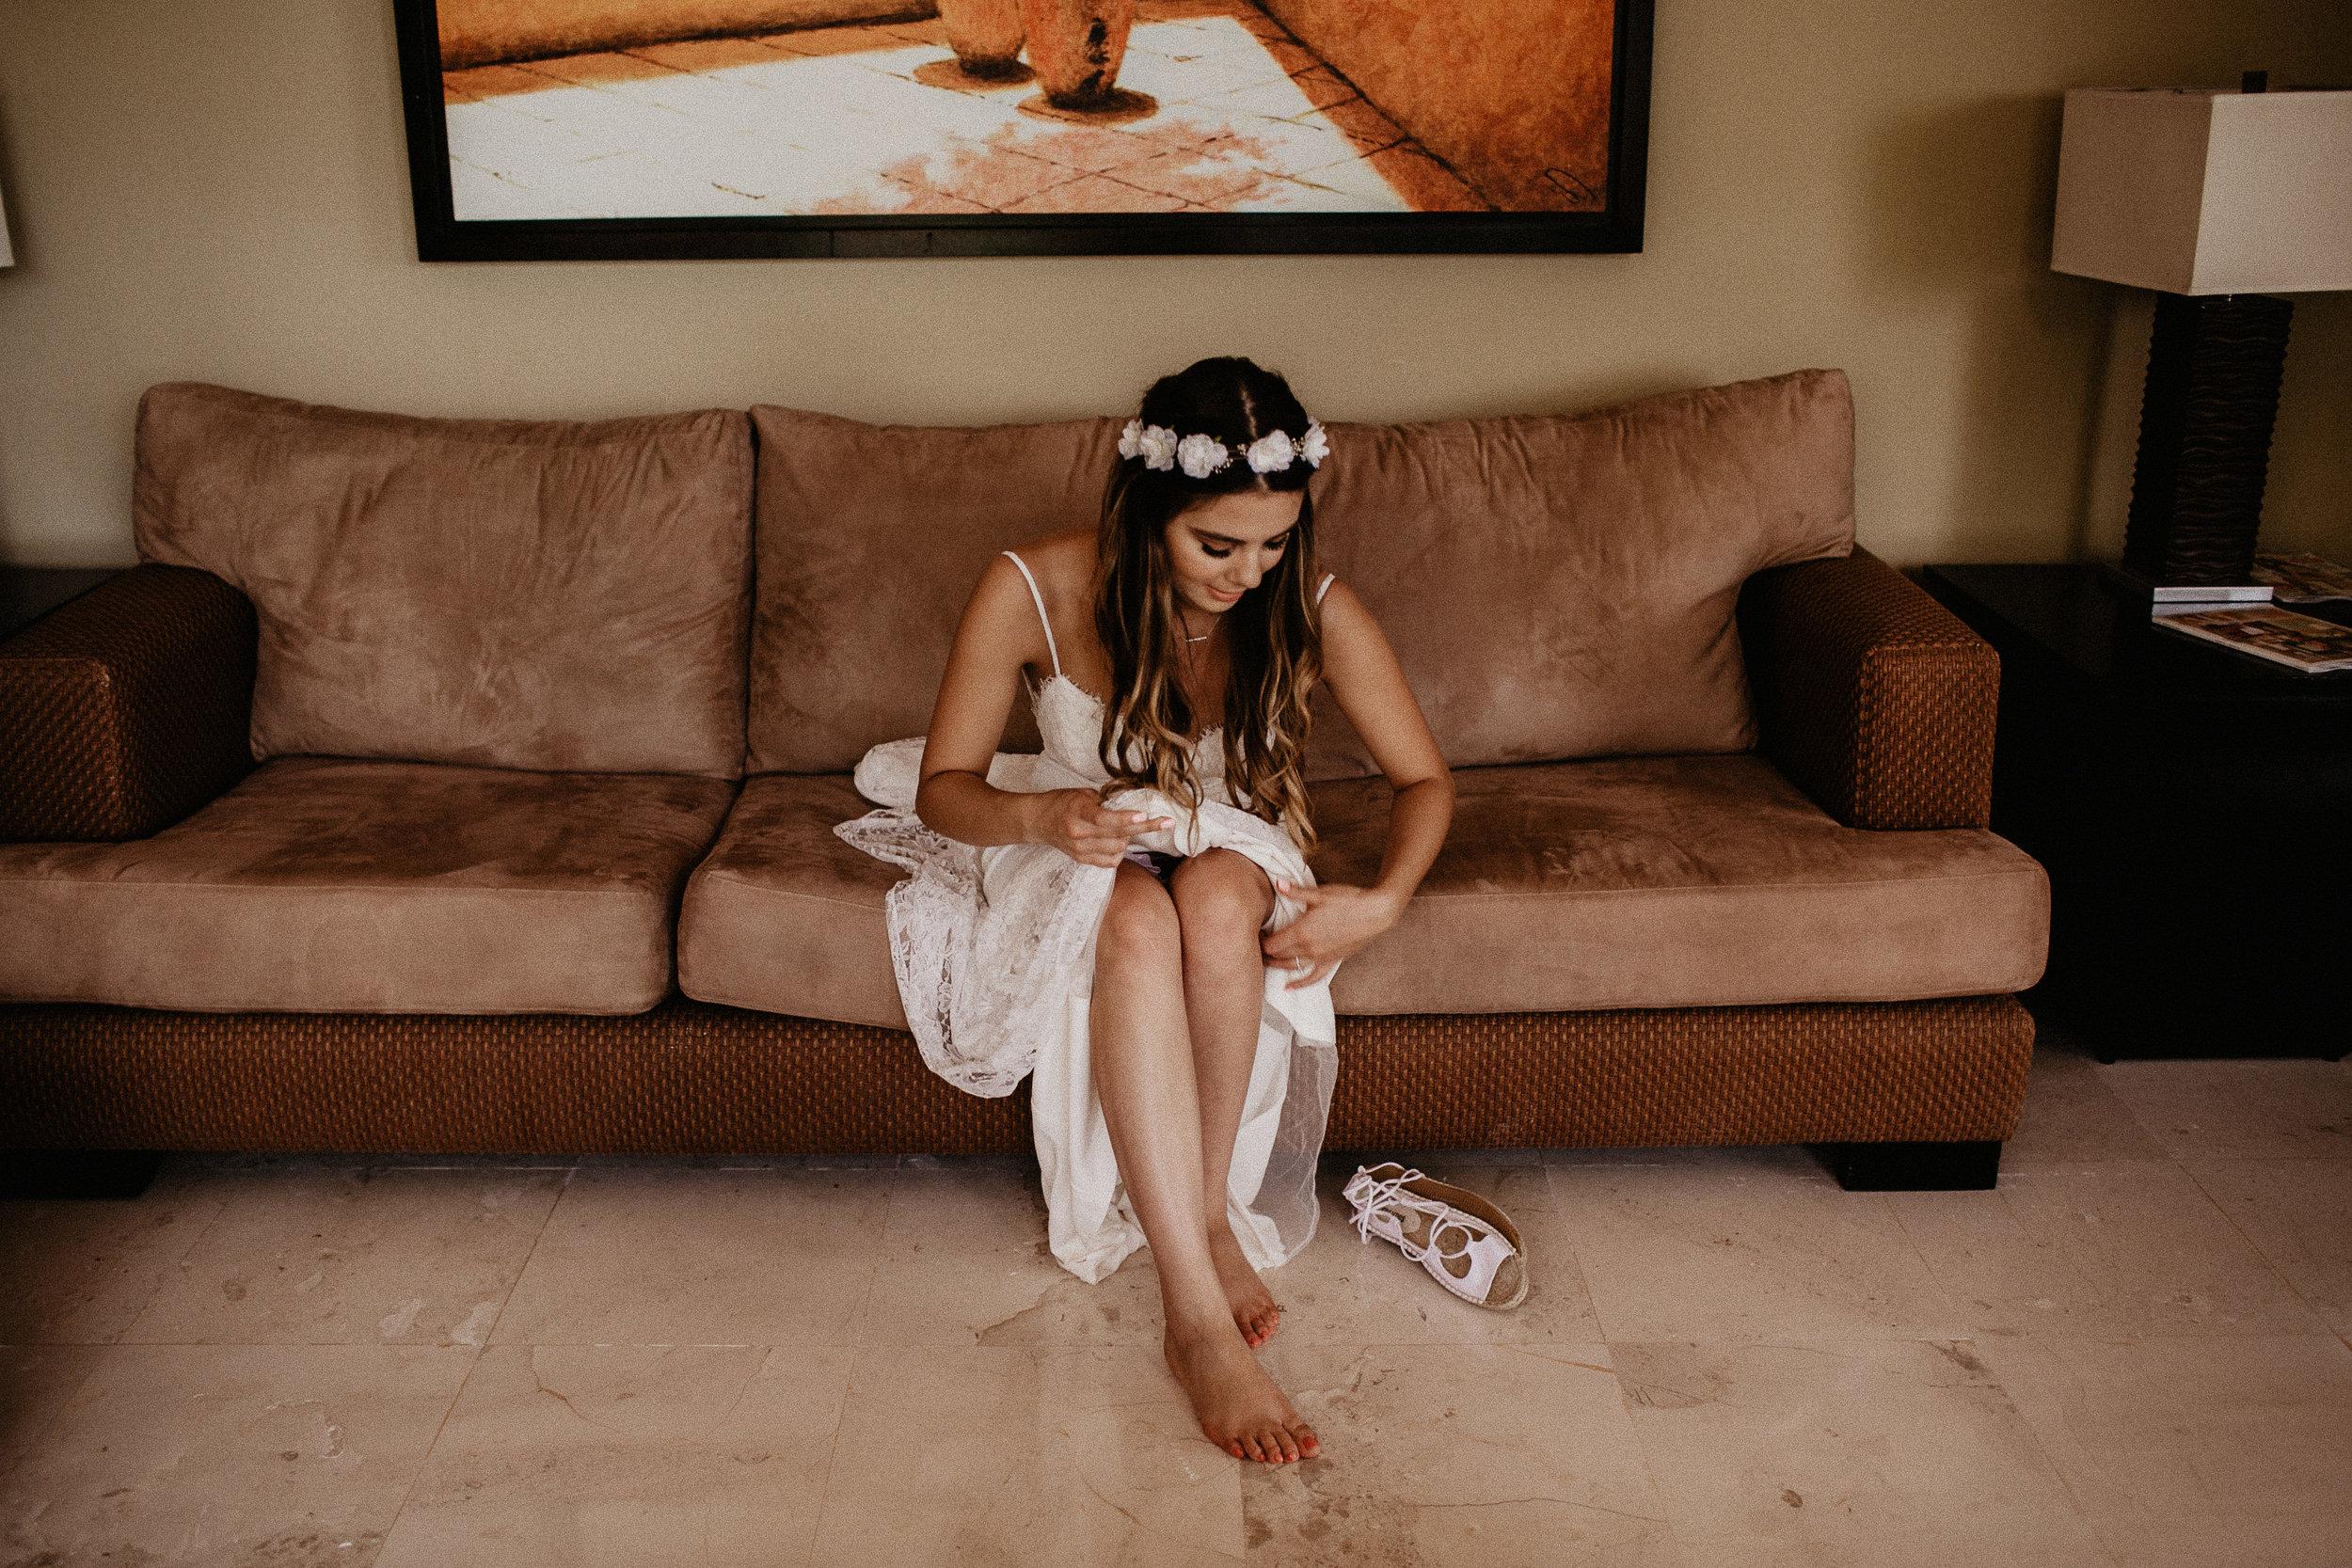 alfonso_flores_destination_wedding_photography_puerto_vallarta_hotel_barcelo_vallarta_cuttler_amela-174.JPG